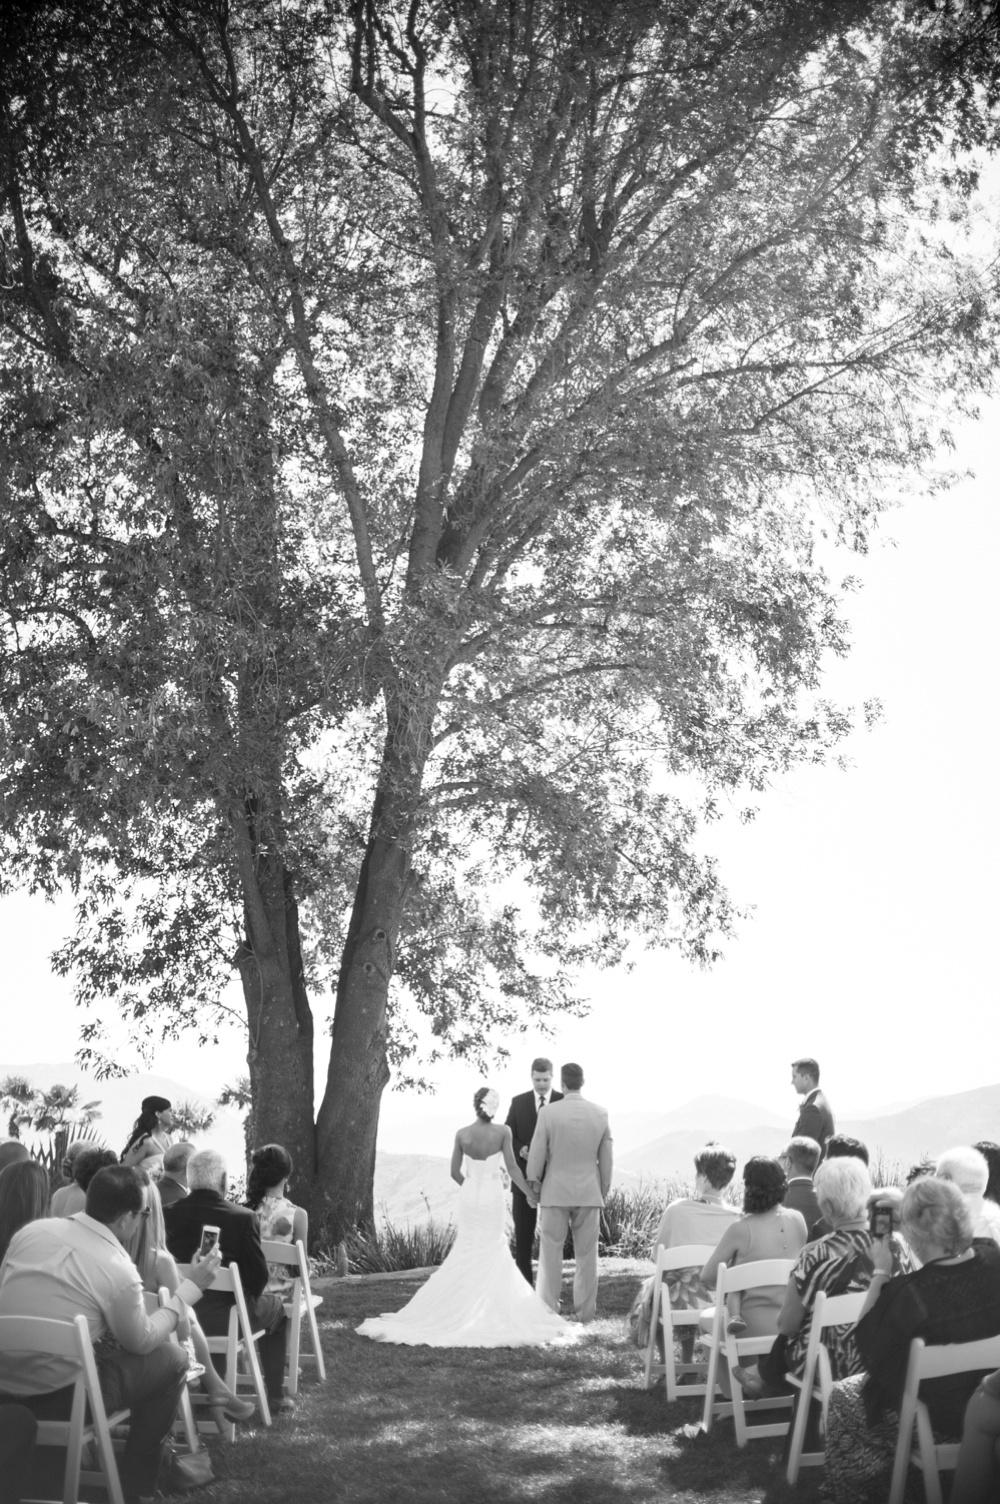 condors_nest_ranch_wedding_photographyJ.JPG